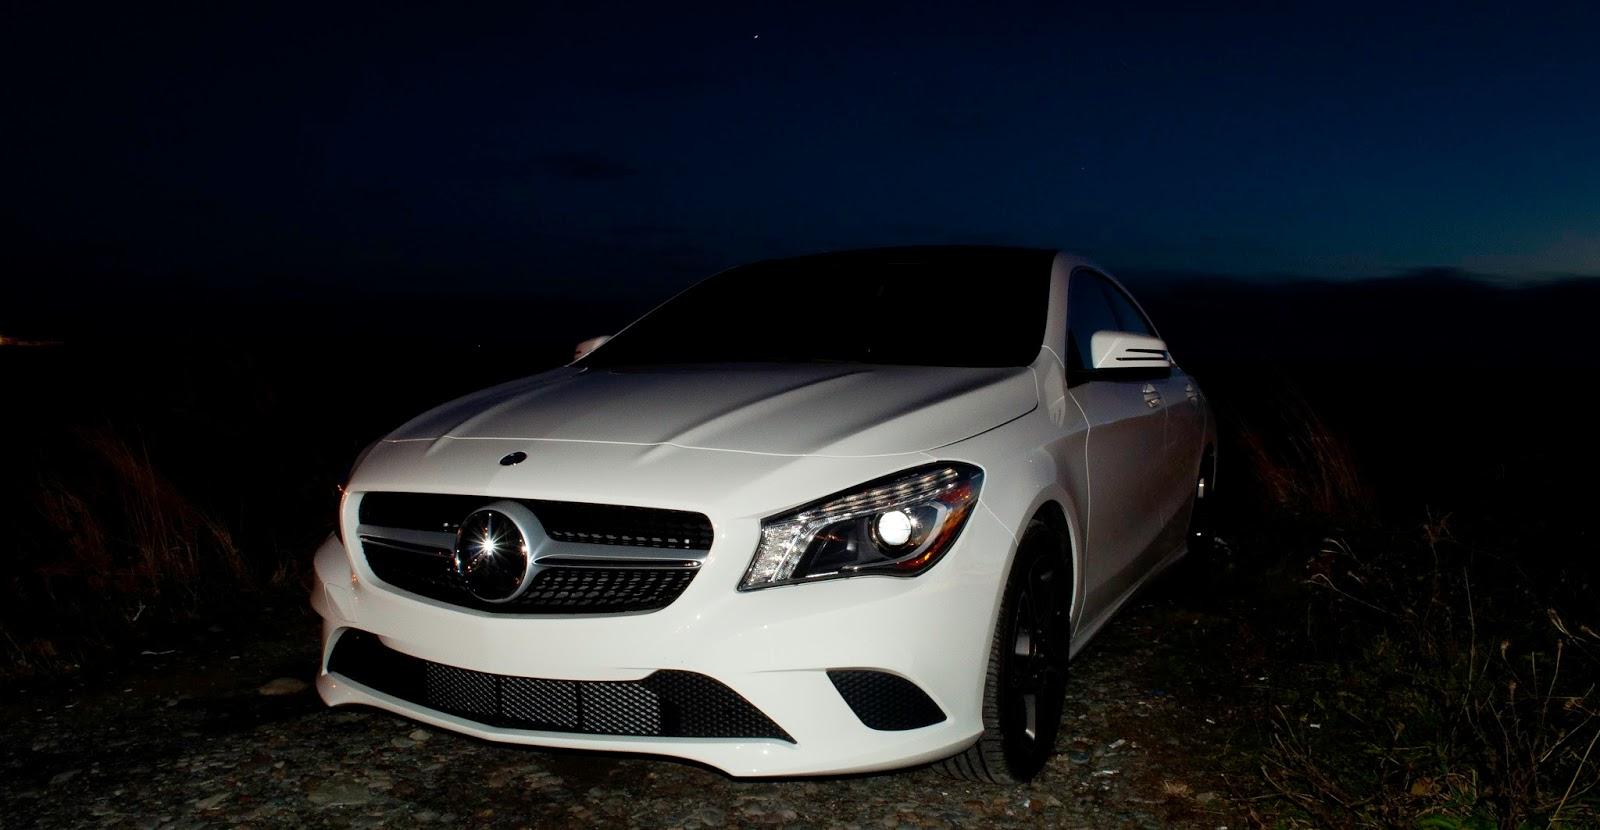 2014 Mercedes Cla 250 White The Image